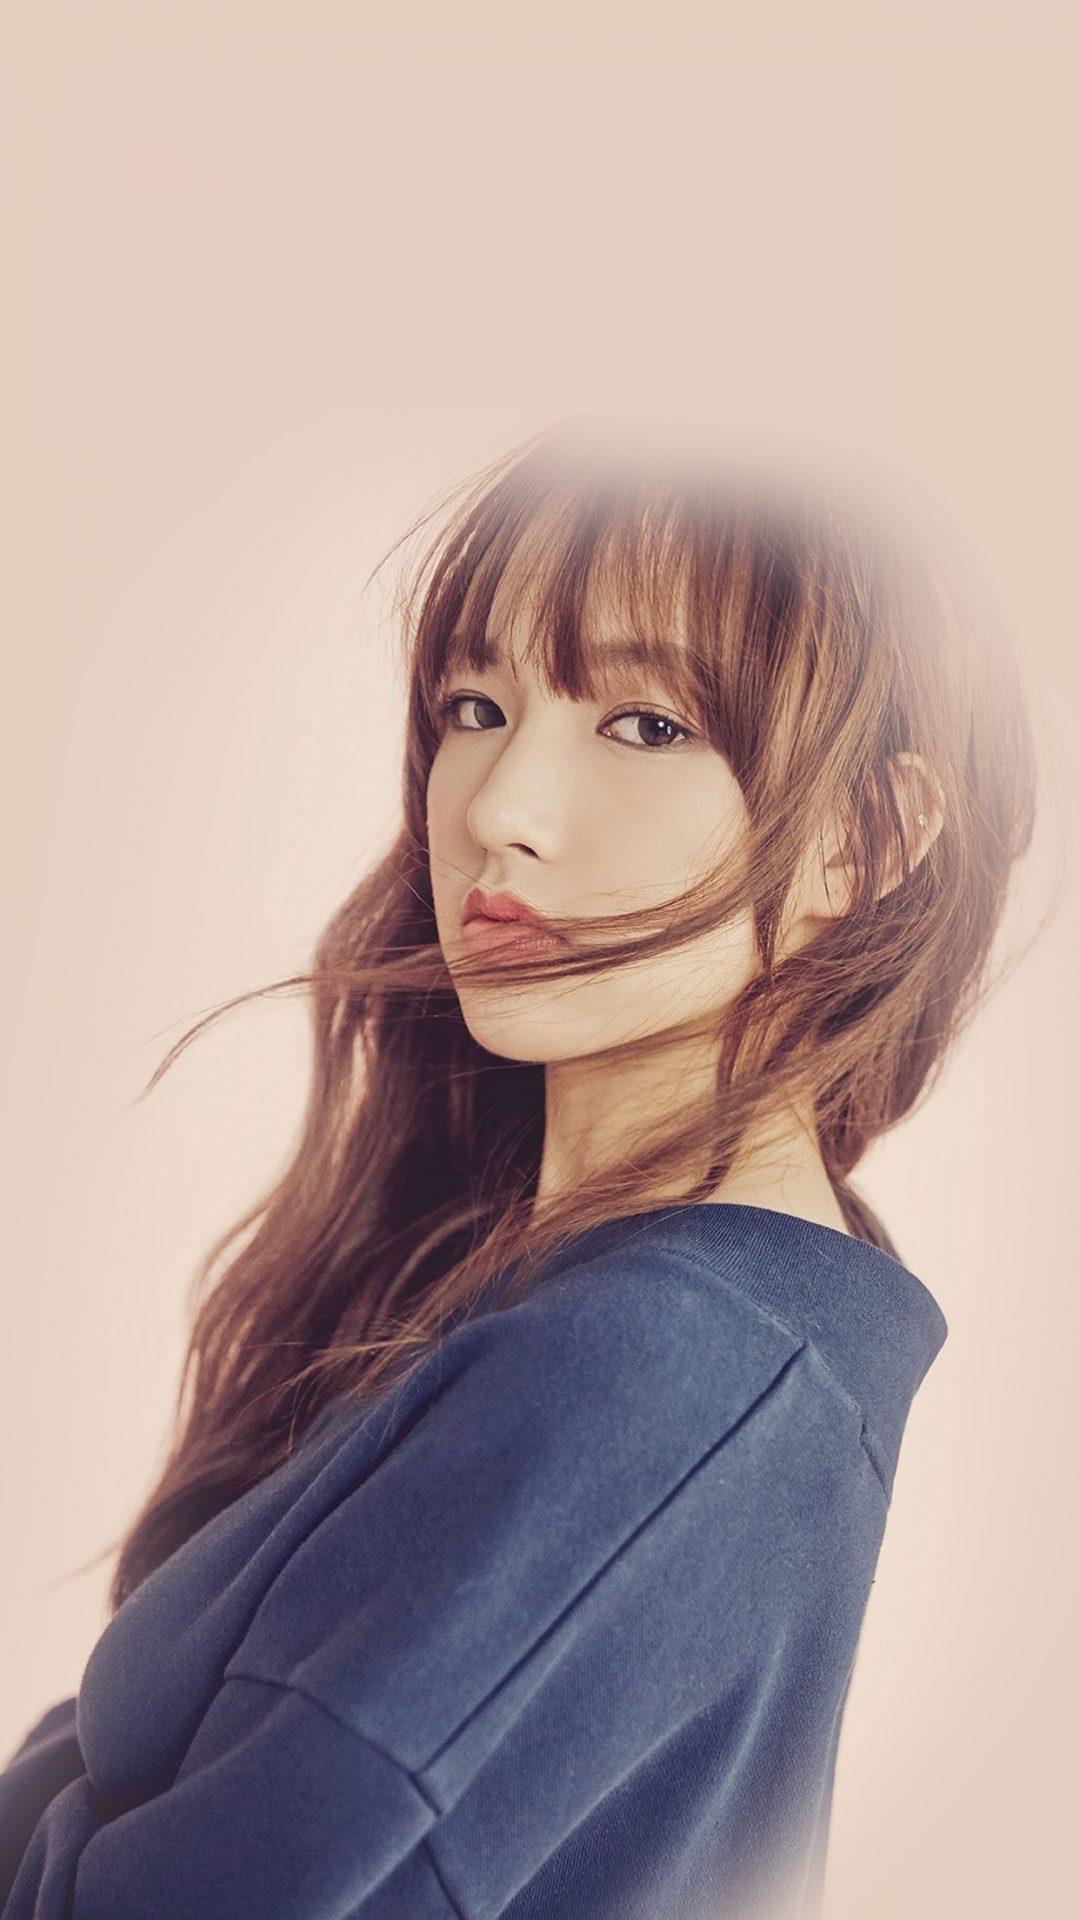 Sungso Kpop Girl Pink Cute